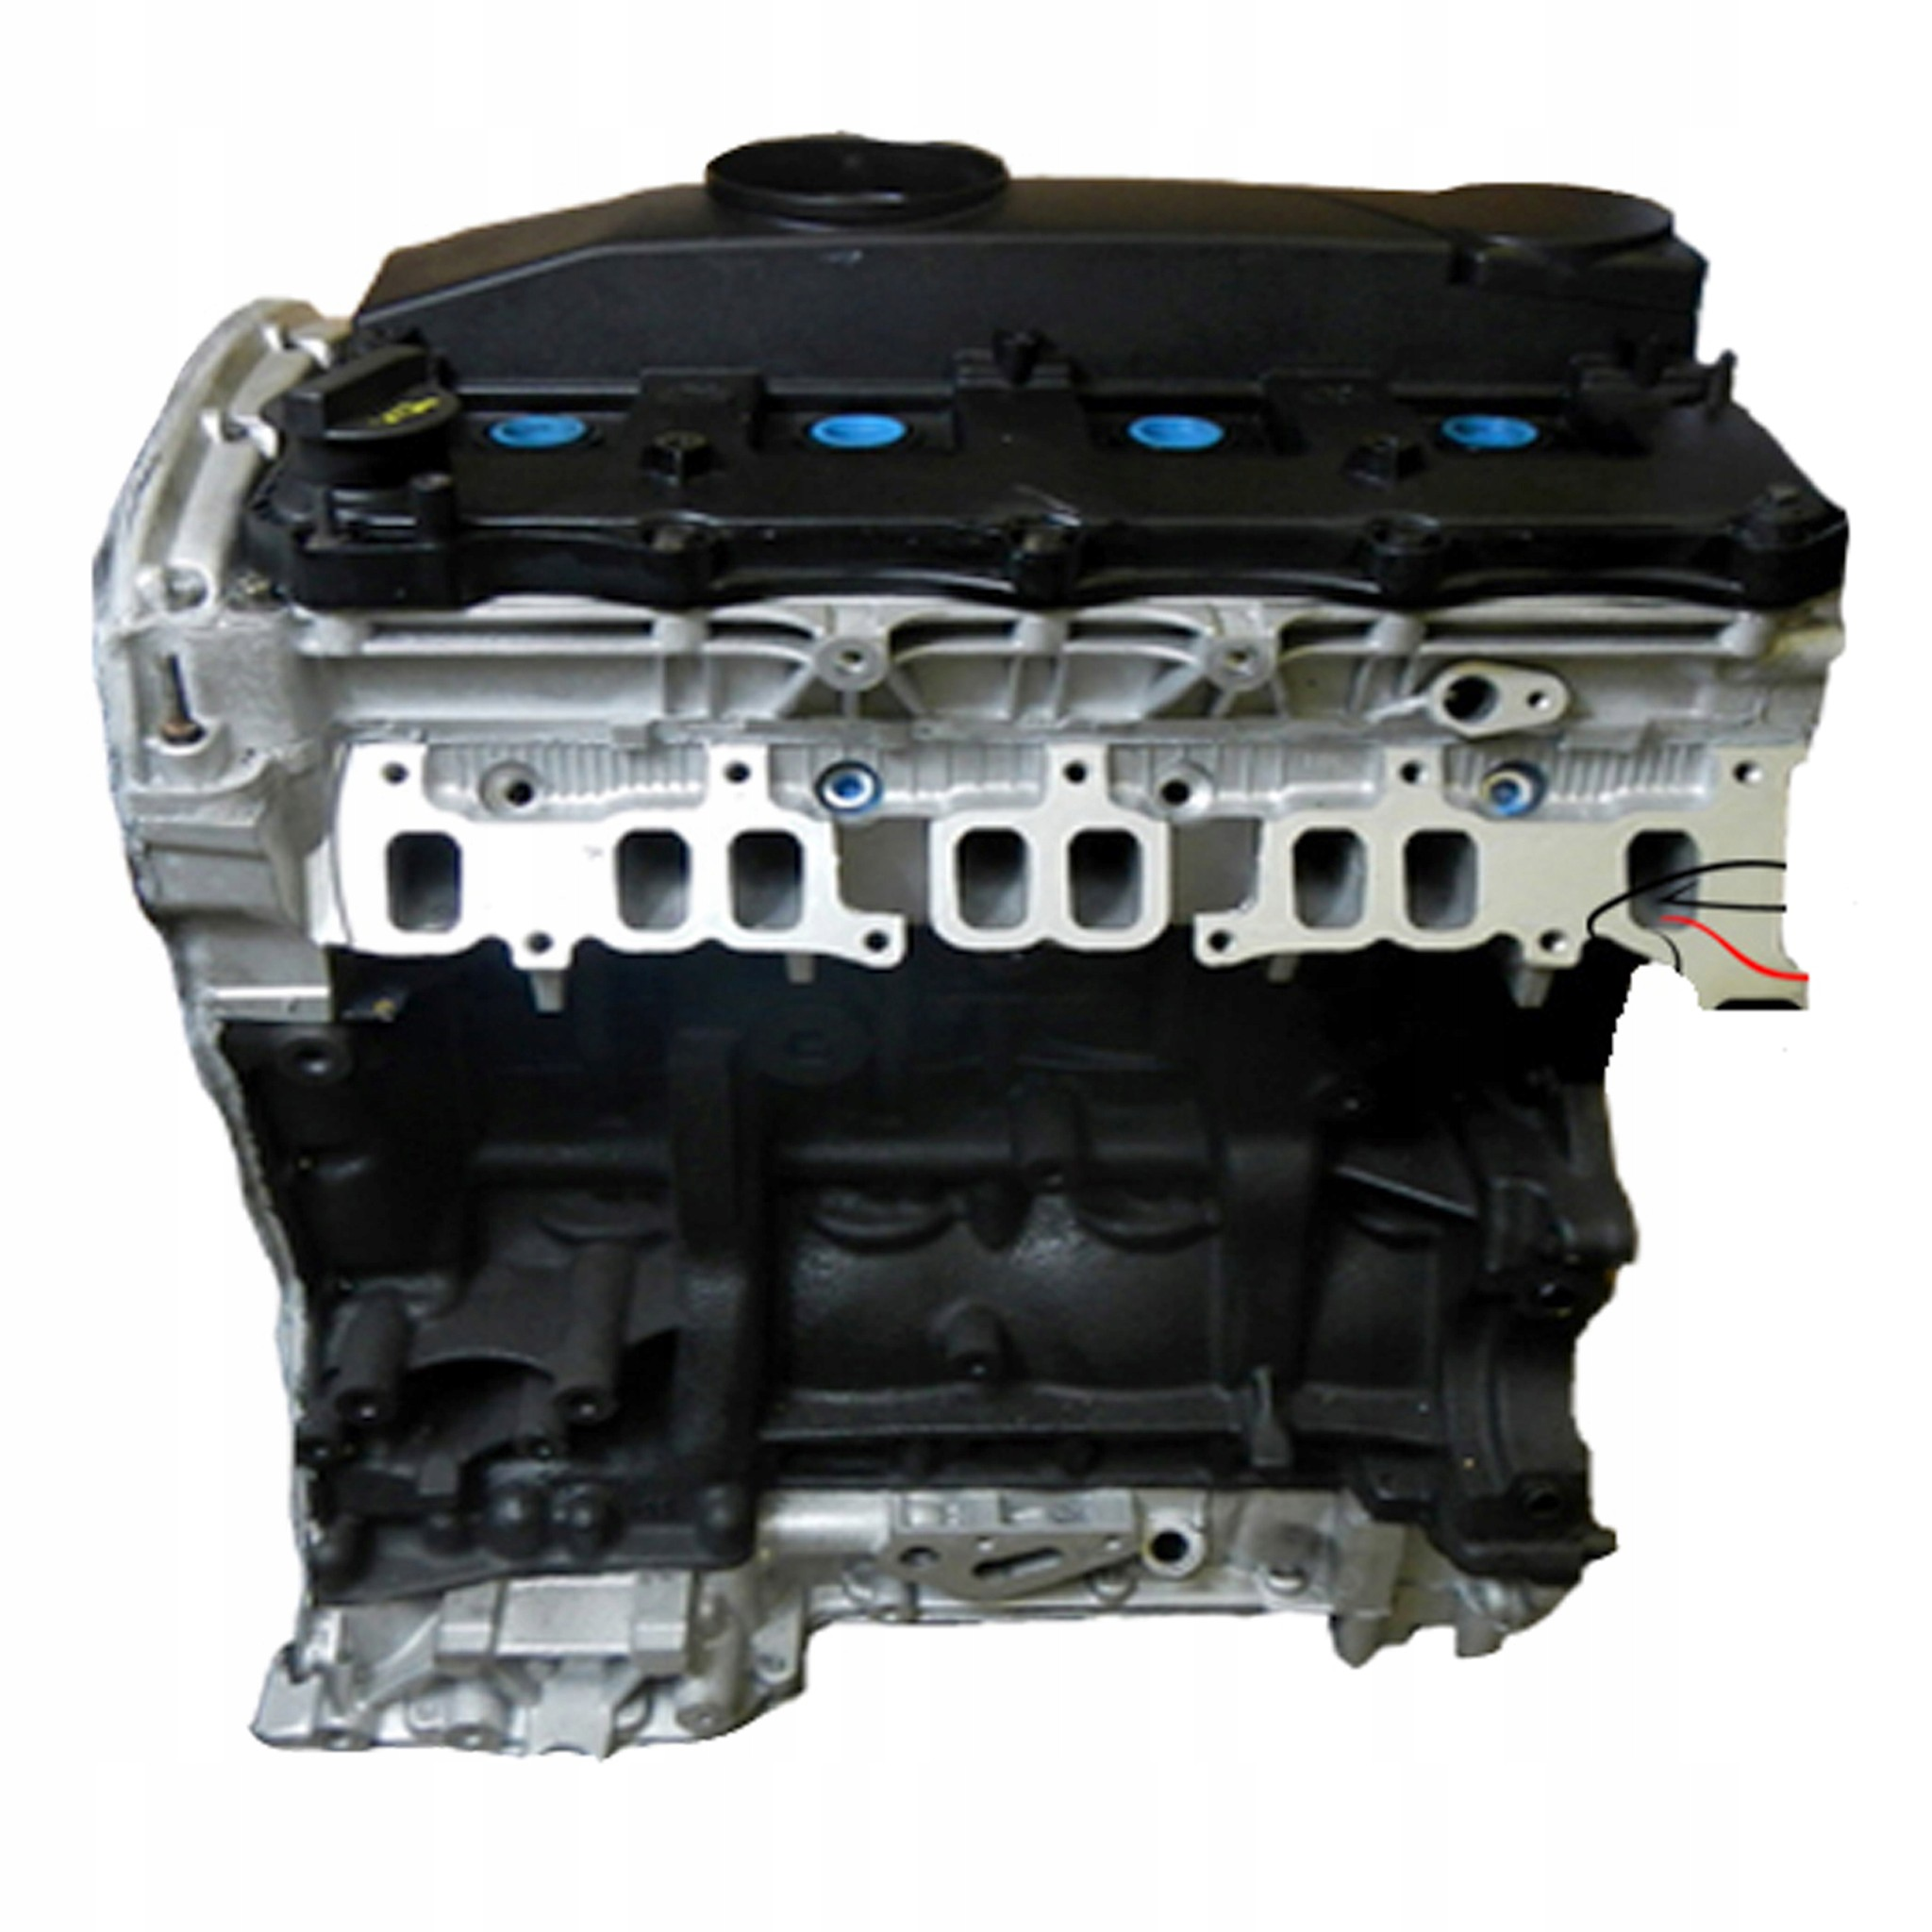 FORD TRANSIT 2.4 TDCI H9FB ДВИГАТЕЛЬ 140KM MOTOR